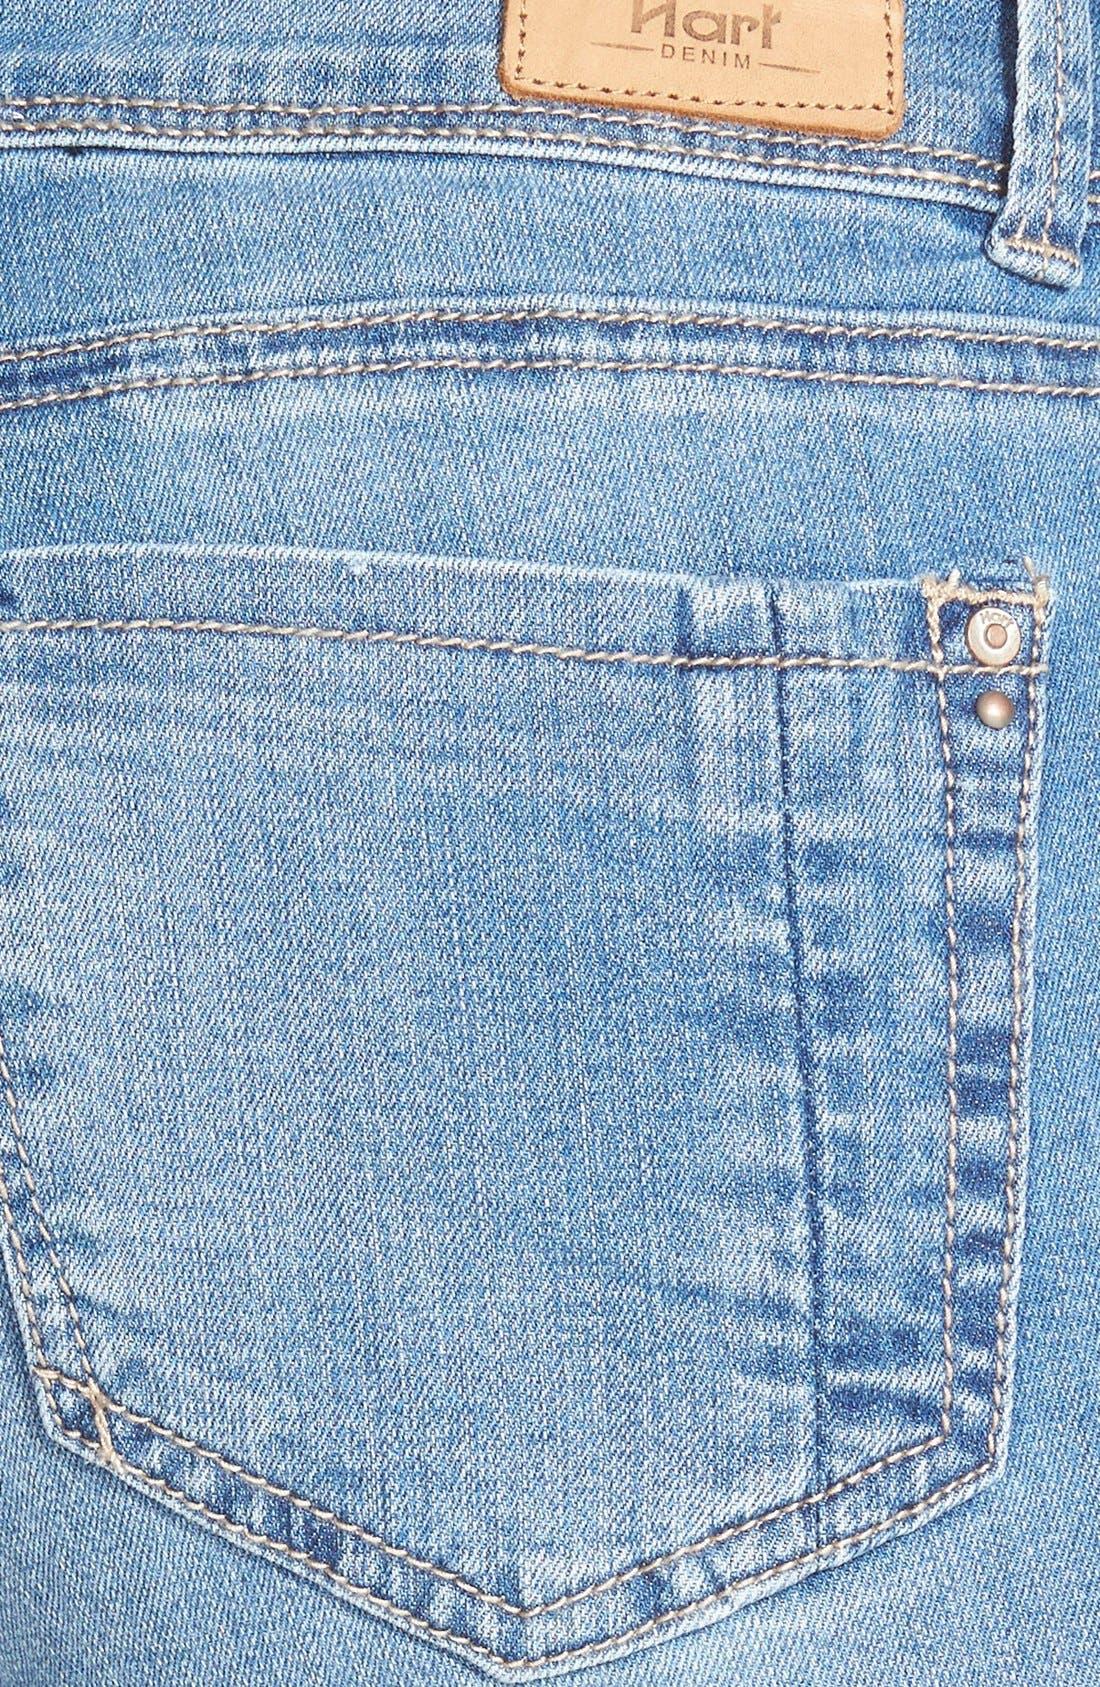 Alternate Image 3  - HART Denim 'Nixie' Cuffed Denim Shorts (Light Stone)